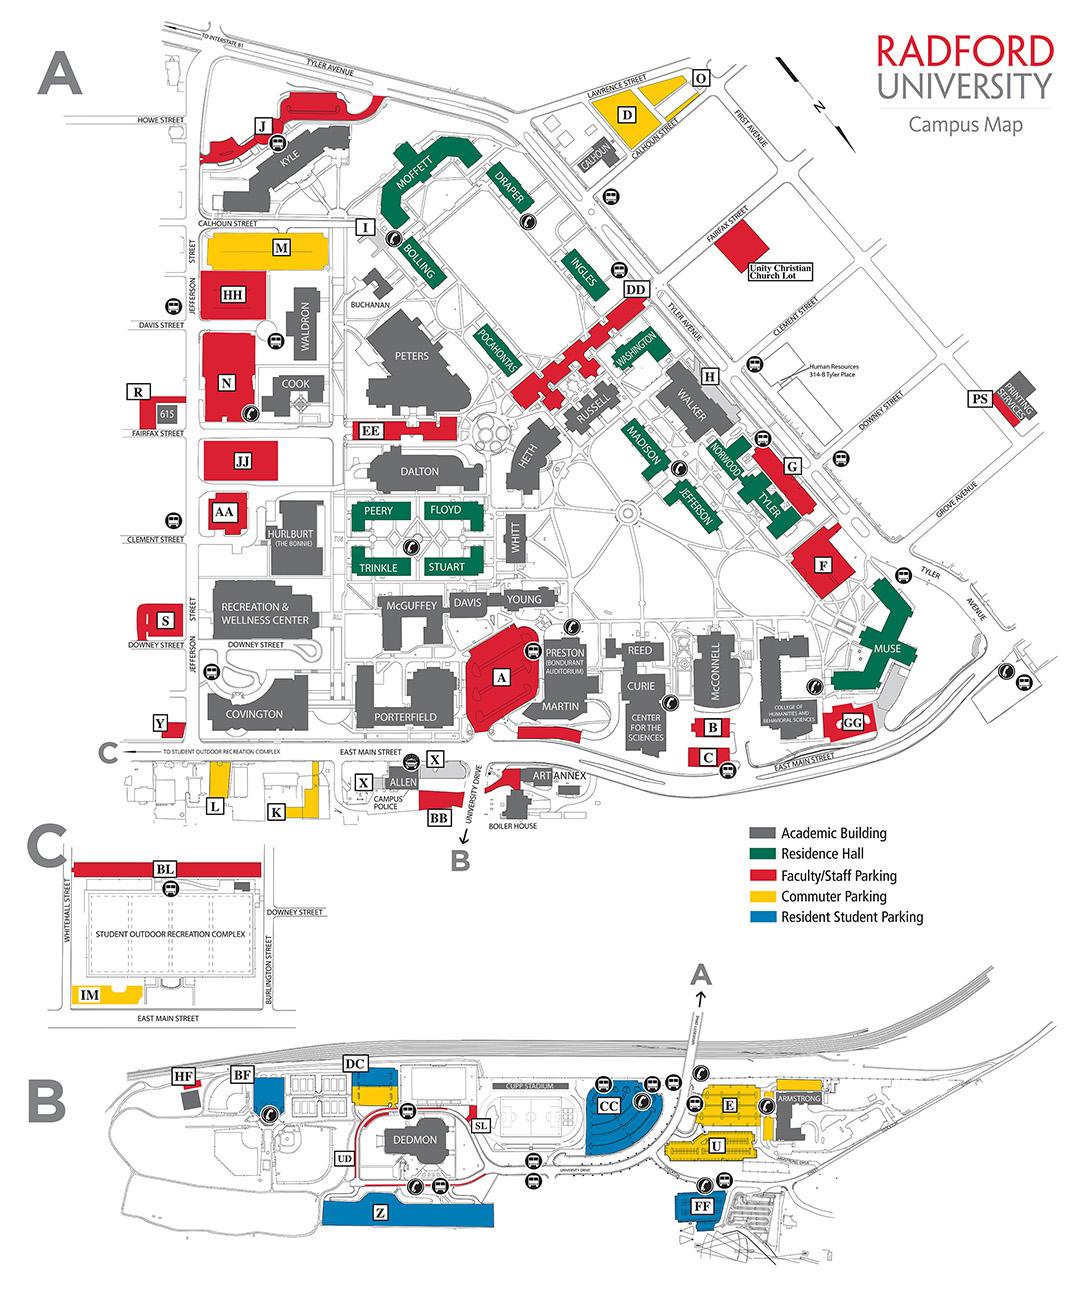 Radford University Campus Map Radford Campus Map | Earth Map